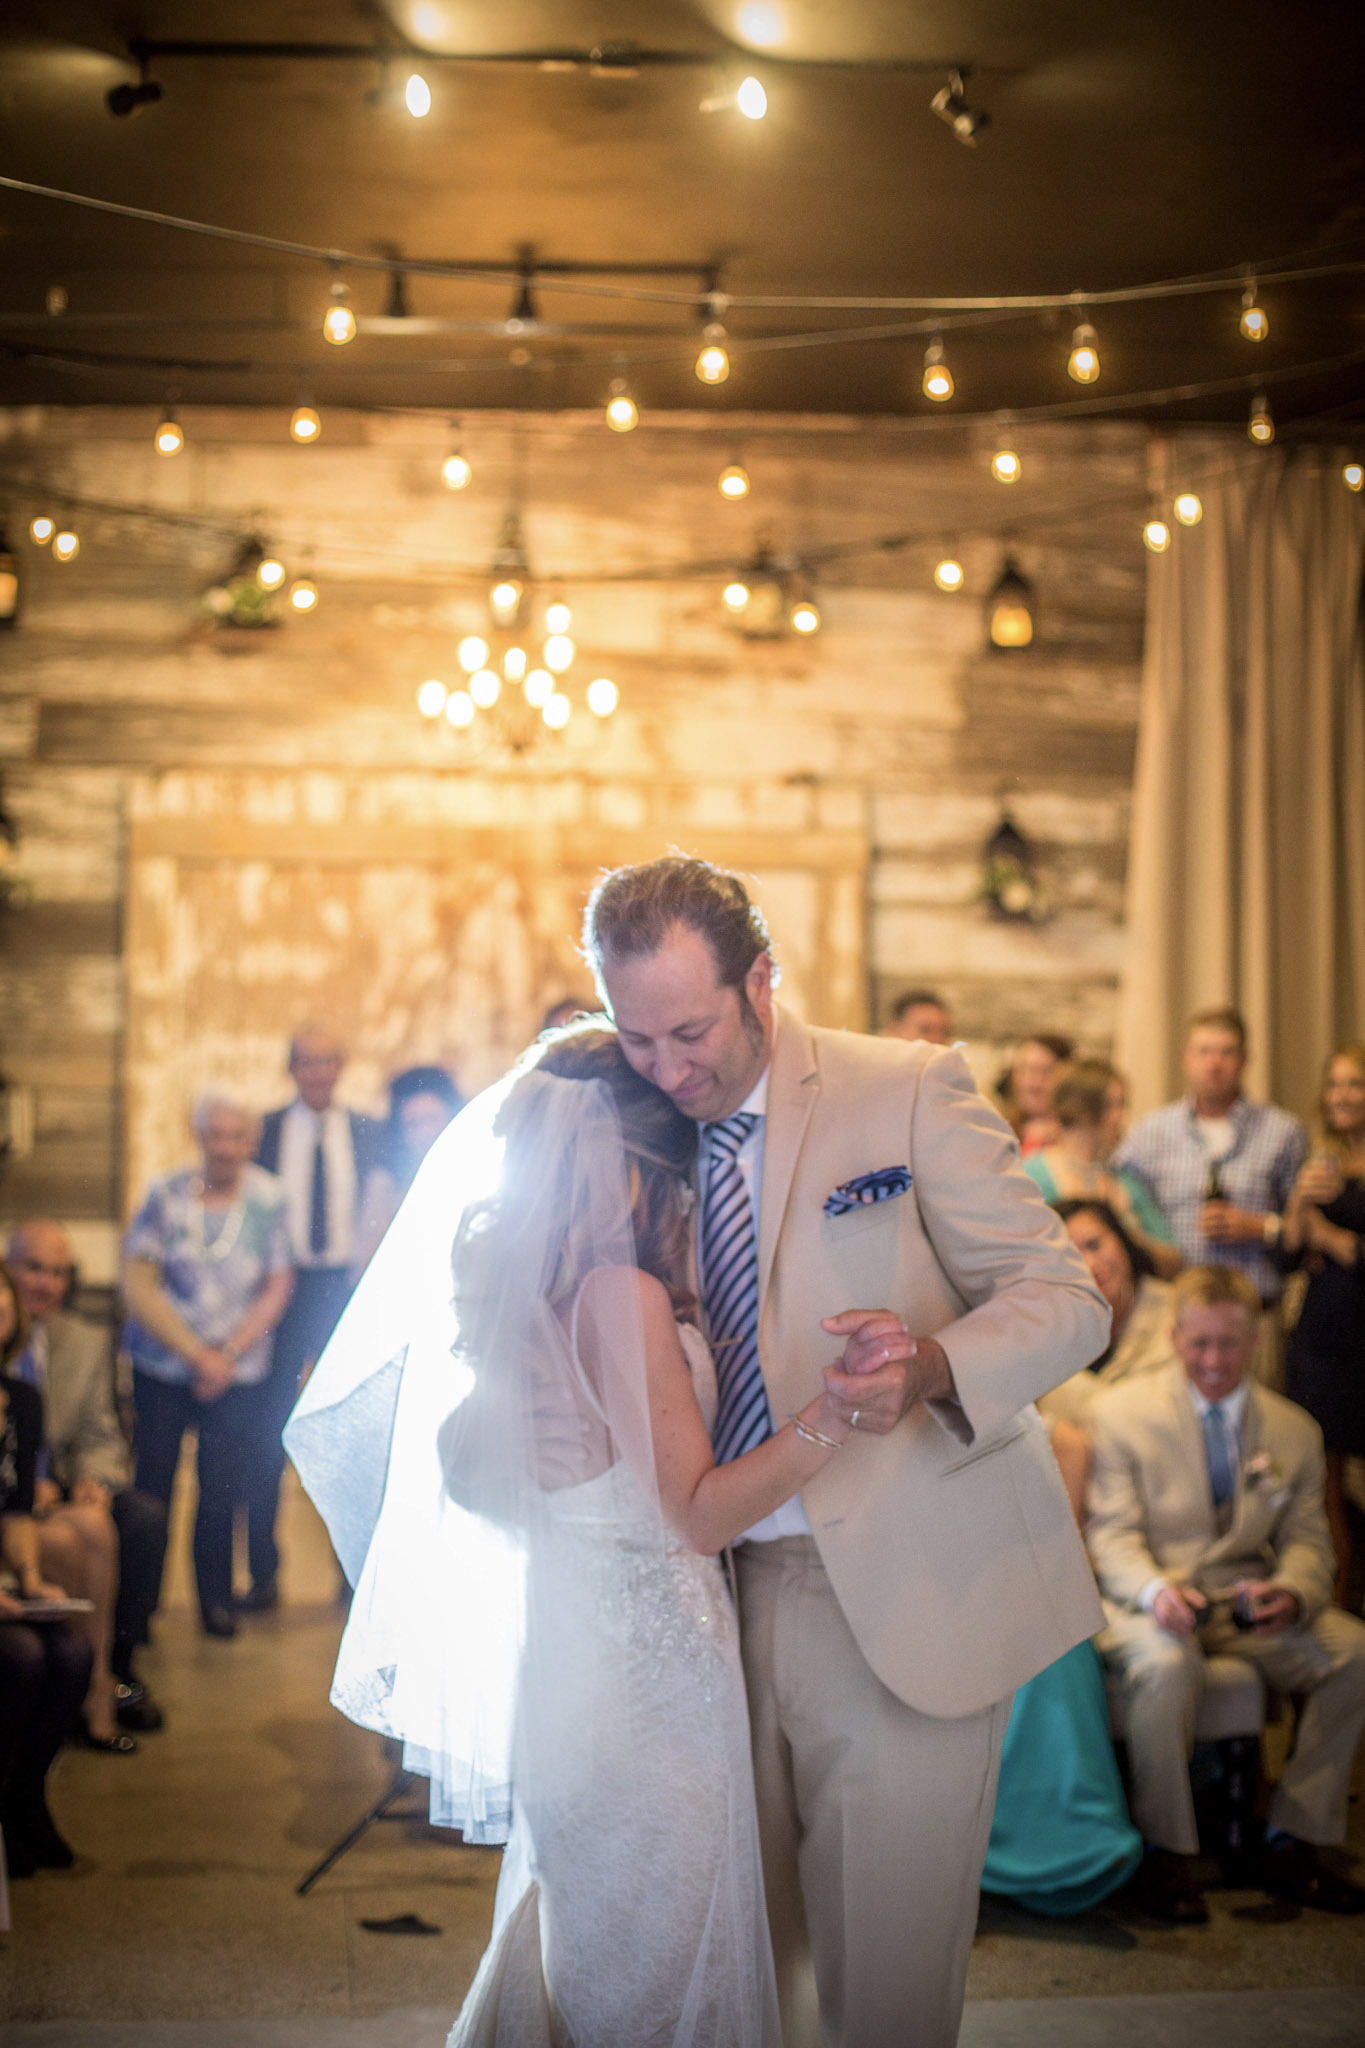 Kansas_City_Small_Wedding_Venue_Elope_Intimate_Ceremony_Budget_Affordable_Megan & Jeff-256.jpg